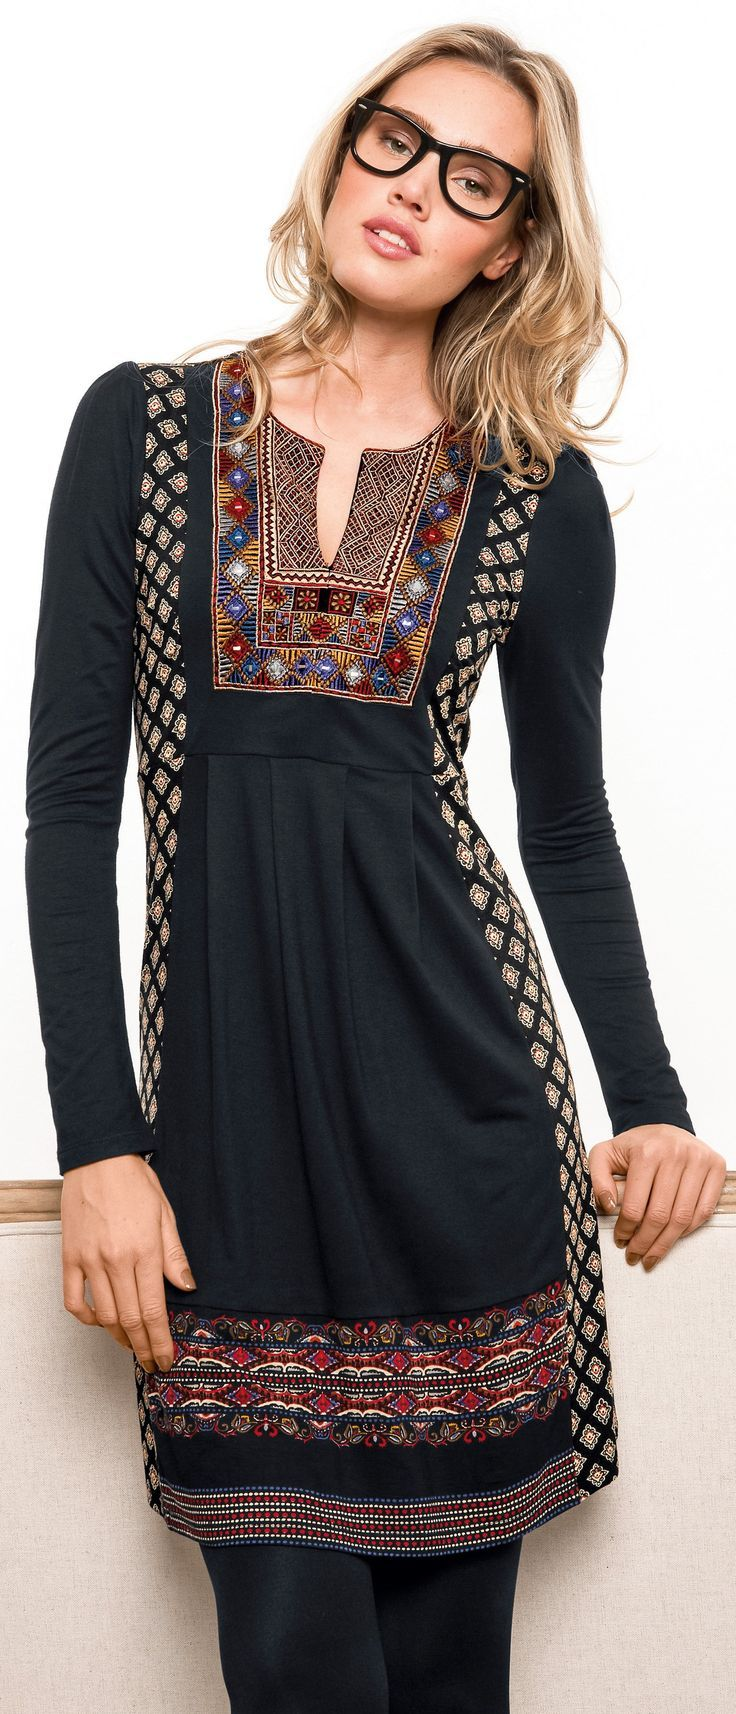 Pin by karen honda on crafting pinterest clothing womens